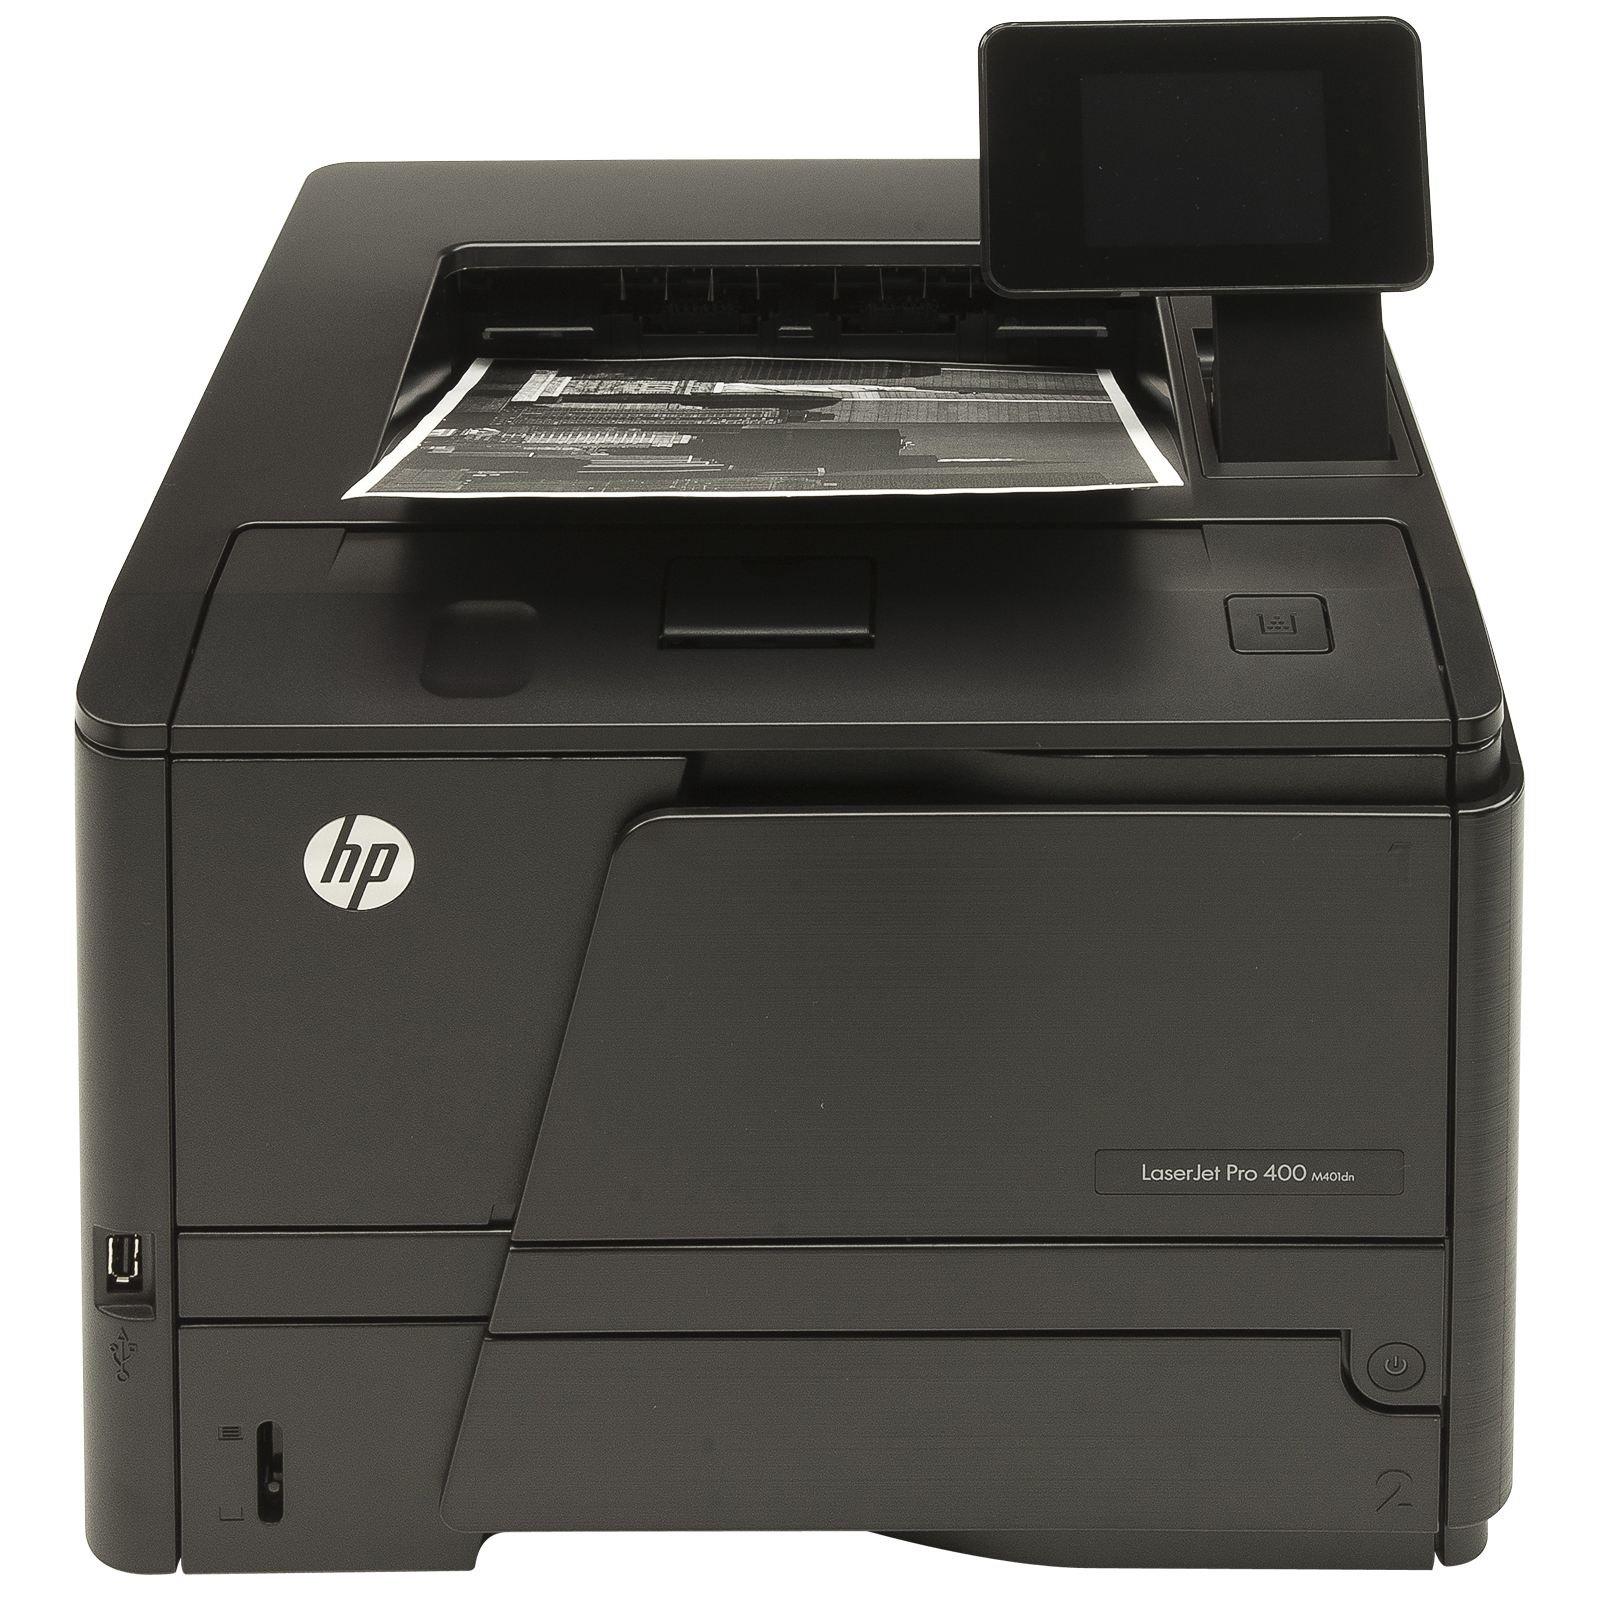 HEWCF278A - HP LaserJet Pro 400 M401dn Laser Printer by Refurbish